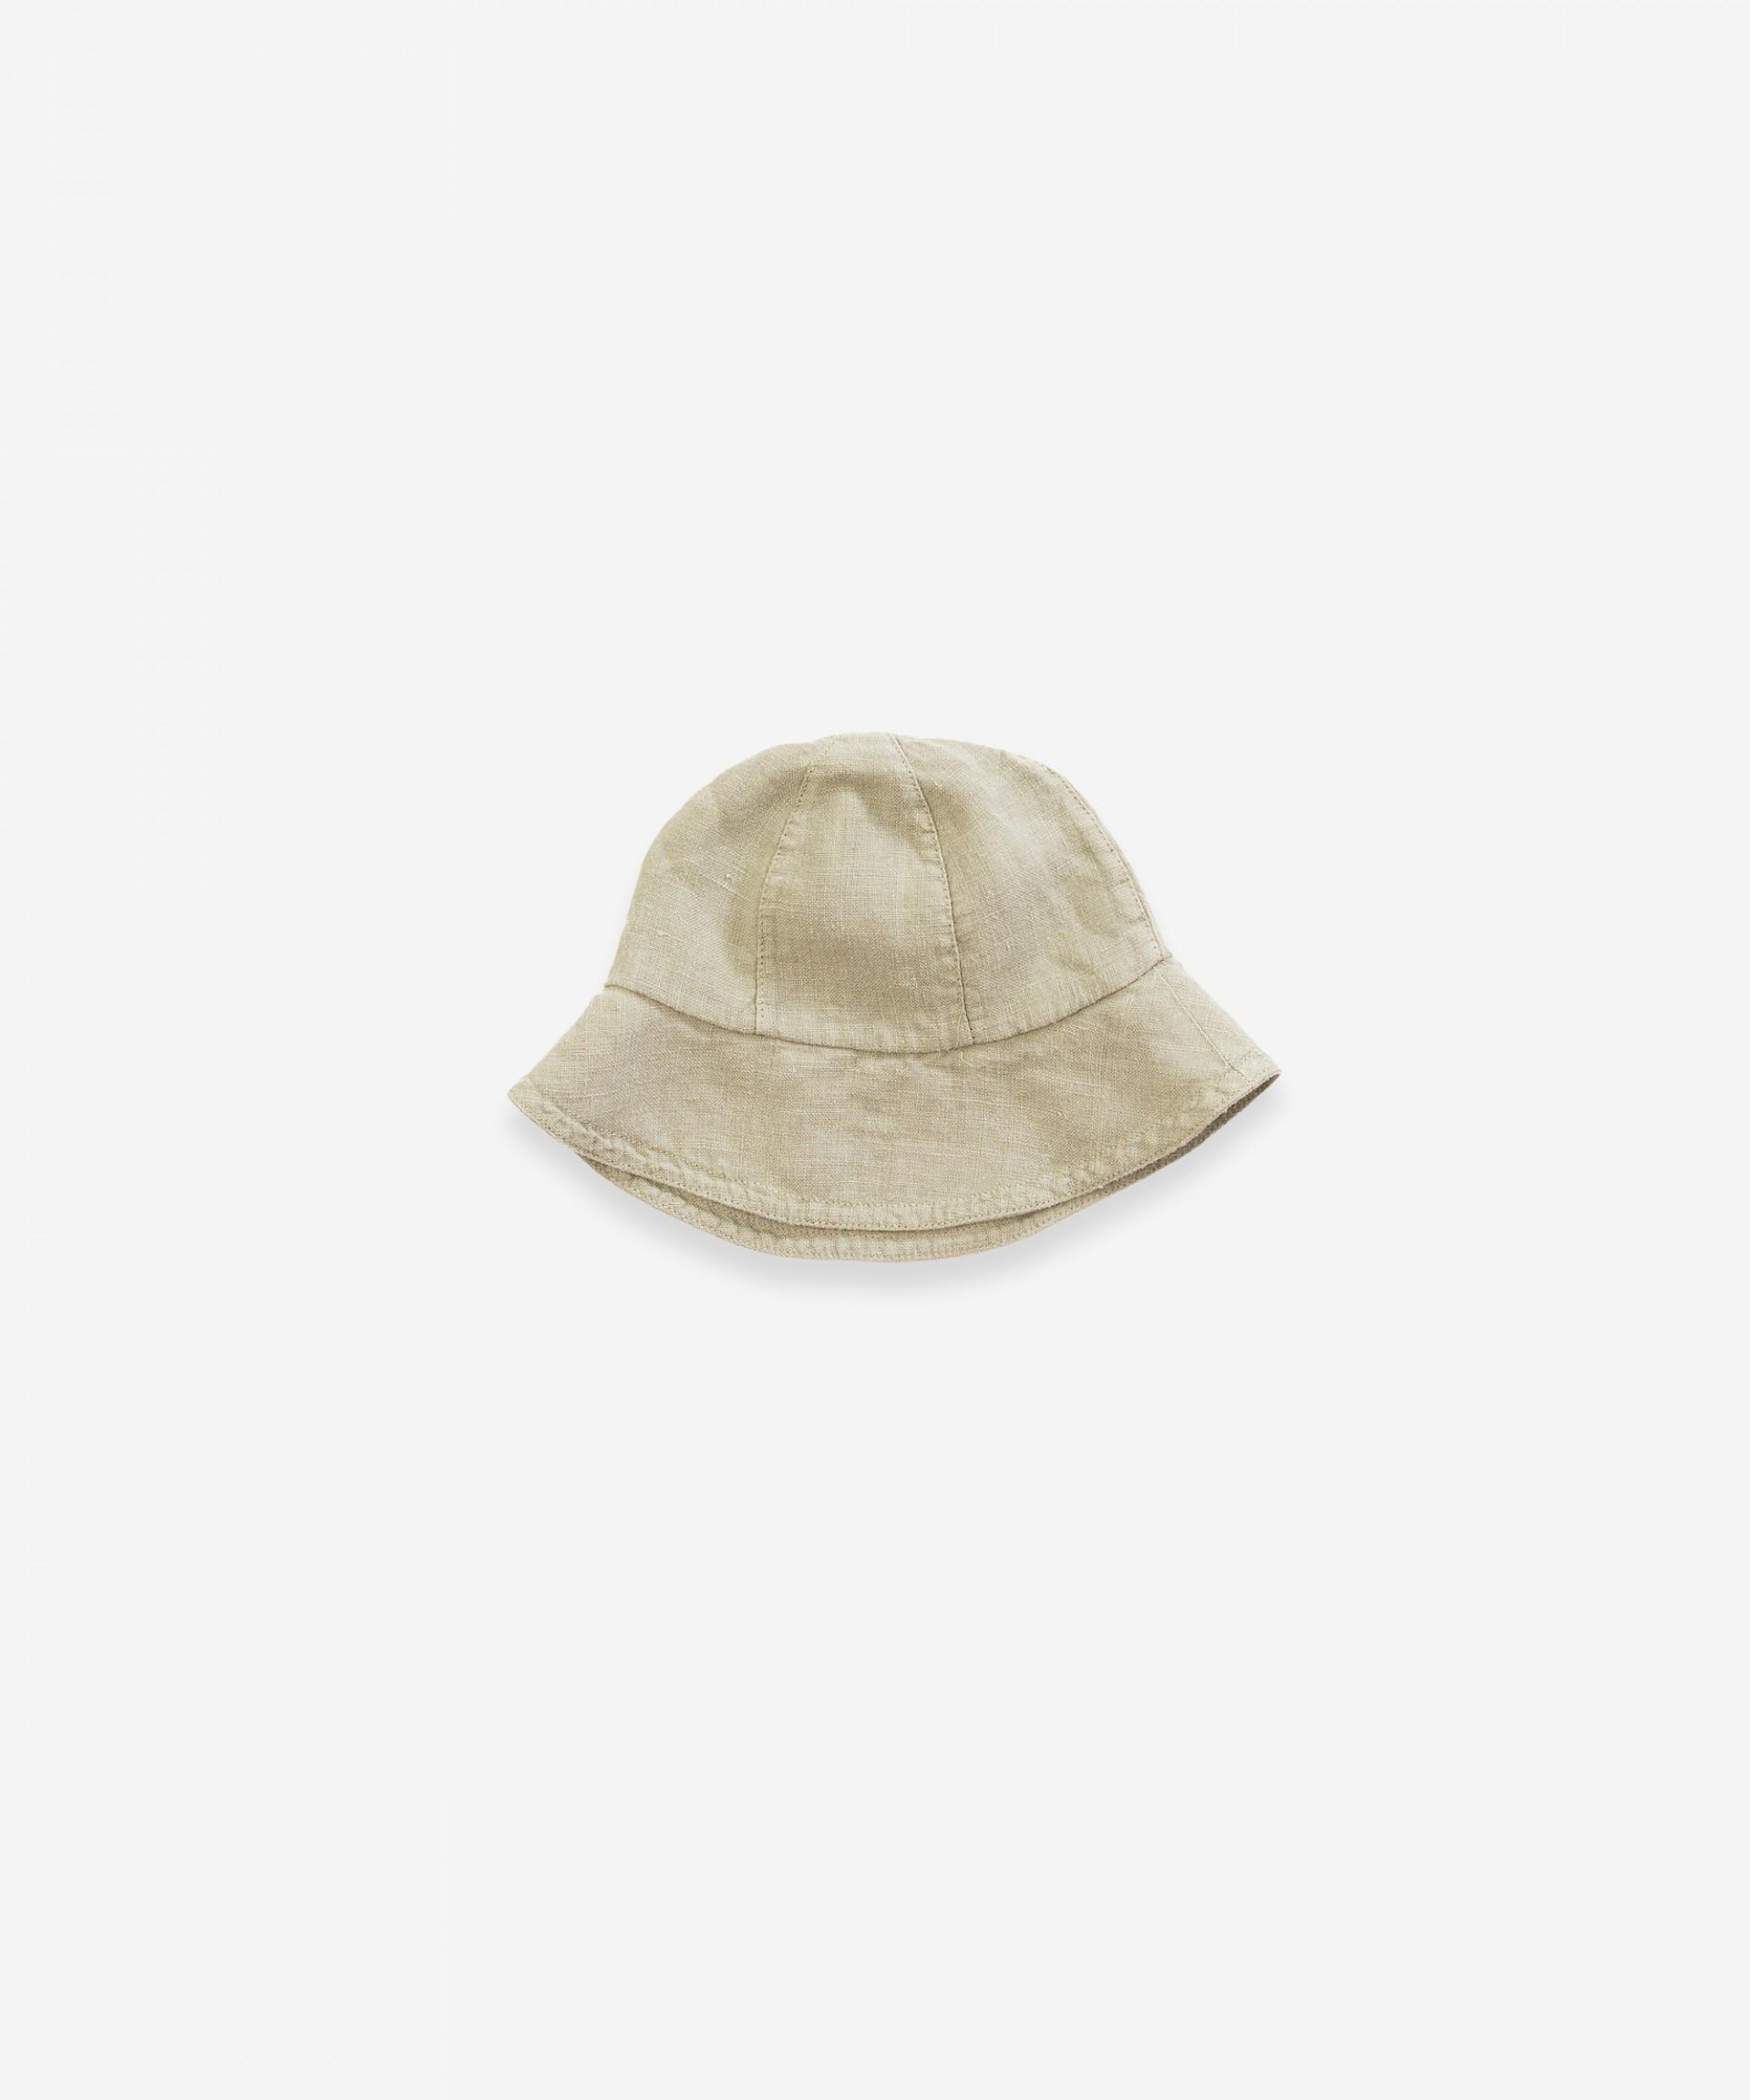 Fabric hat | Weaving